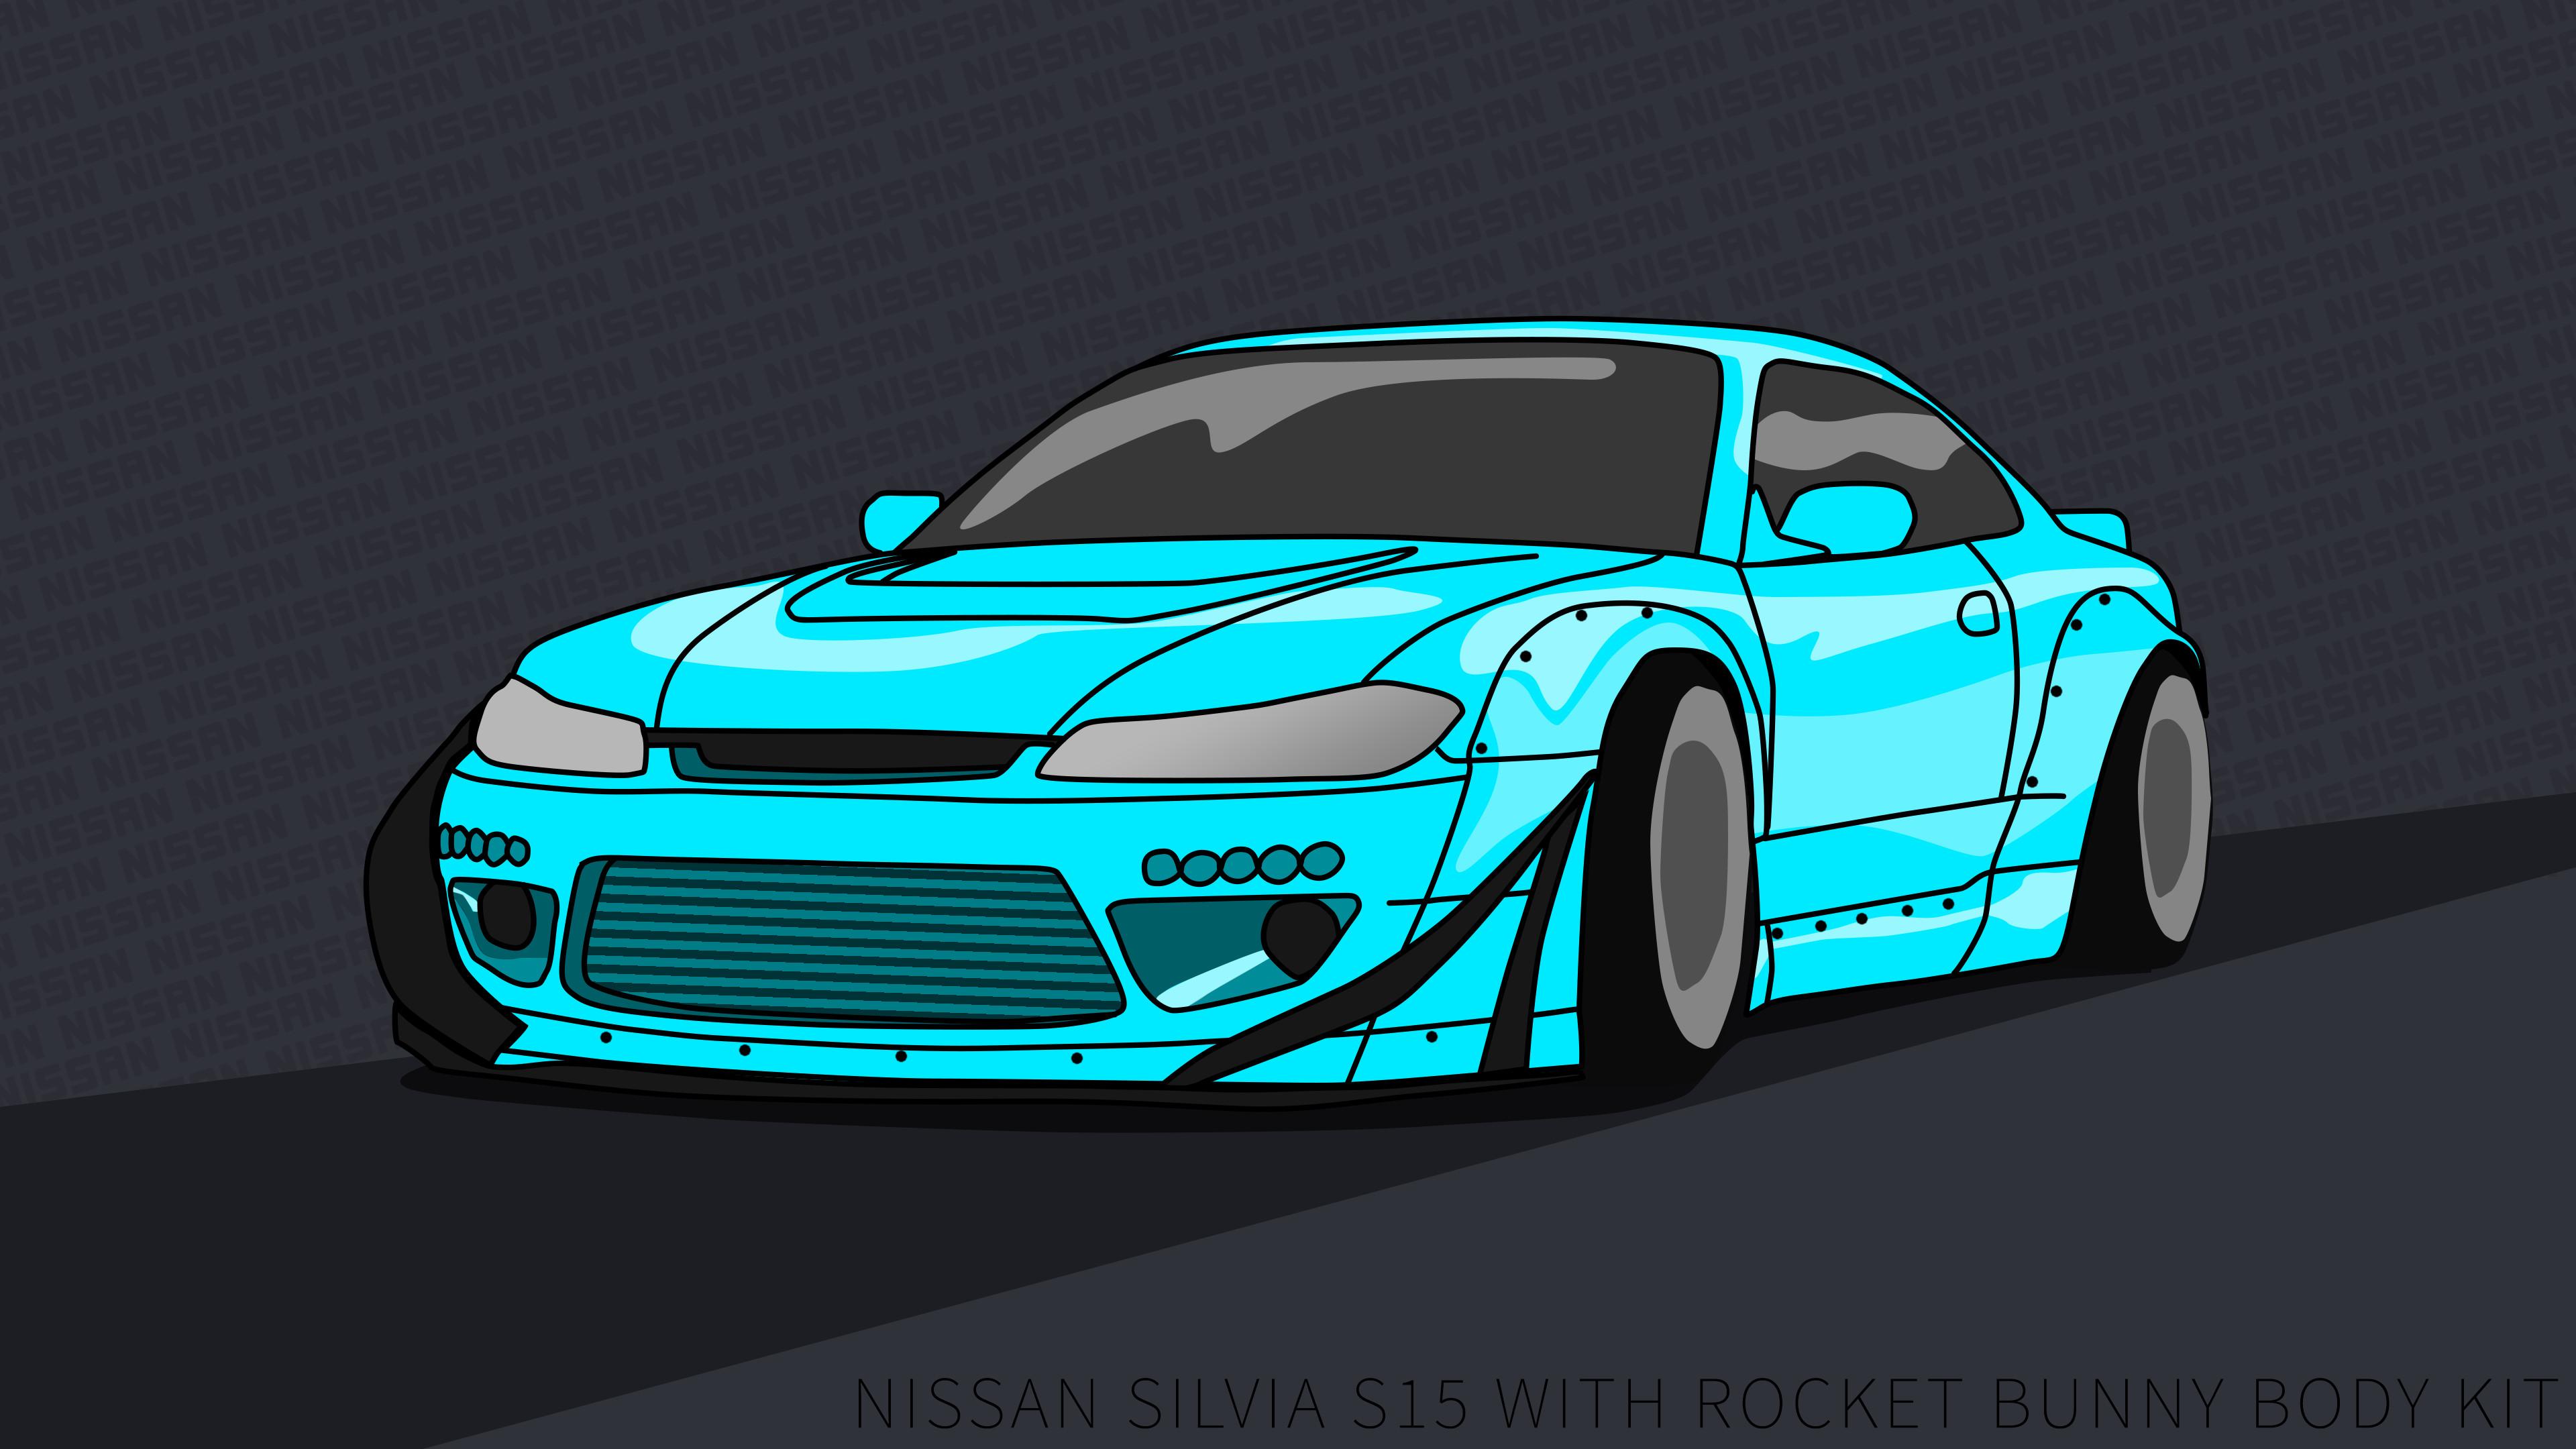 Res: 3840x2160, Nissan Silvia S15 wallpaper 4k rocket bunny LgtBlu by ItsBarney01